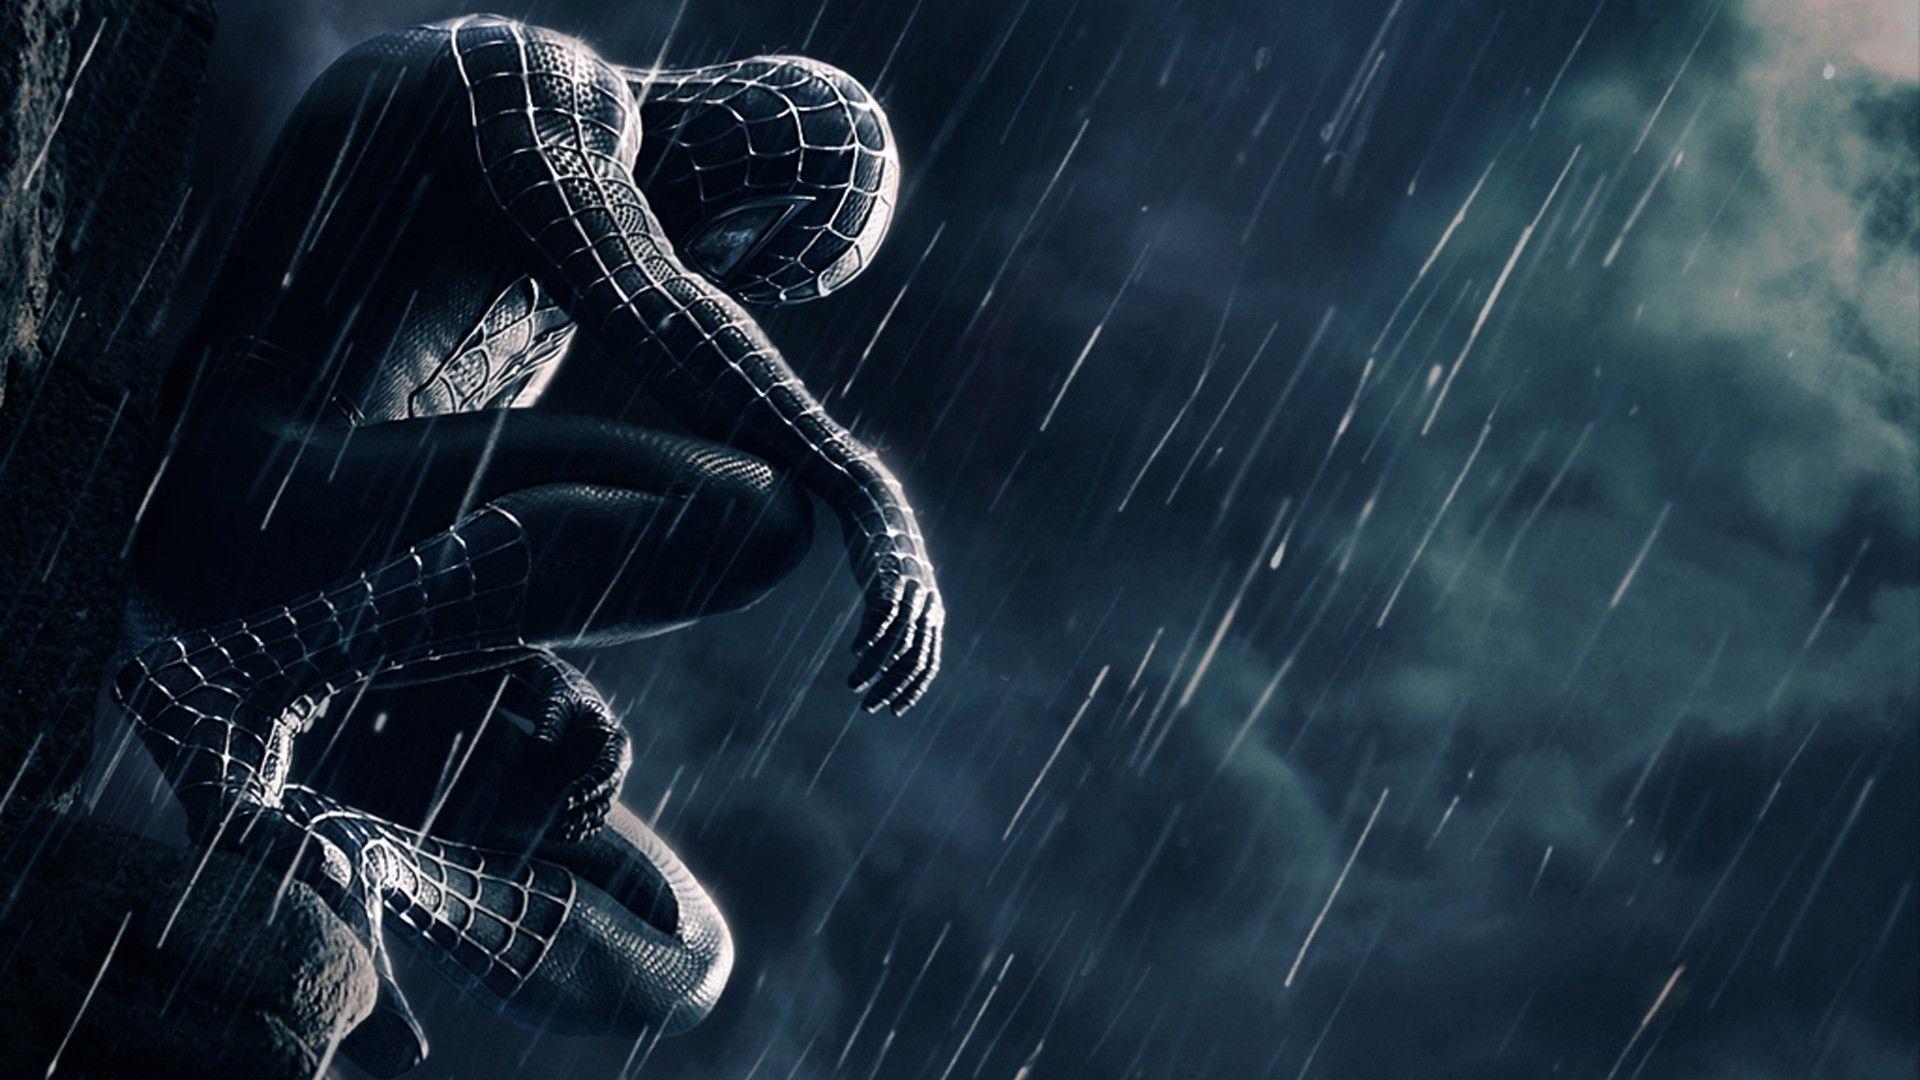 Fondo De Pantalla De Spiderm An Para Iphone G6d Spiderman Pictures Rain Wallpapers Amazing Spiderman Movie